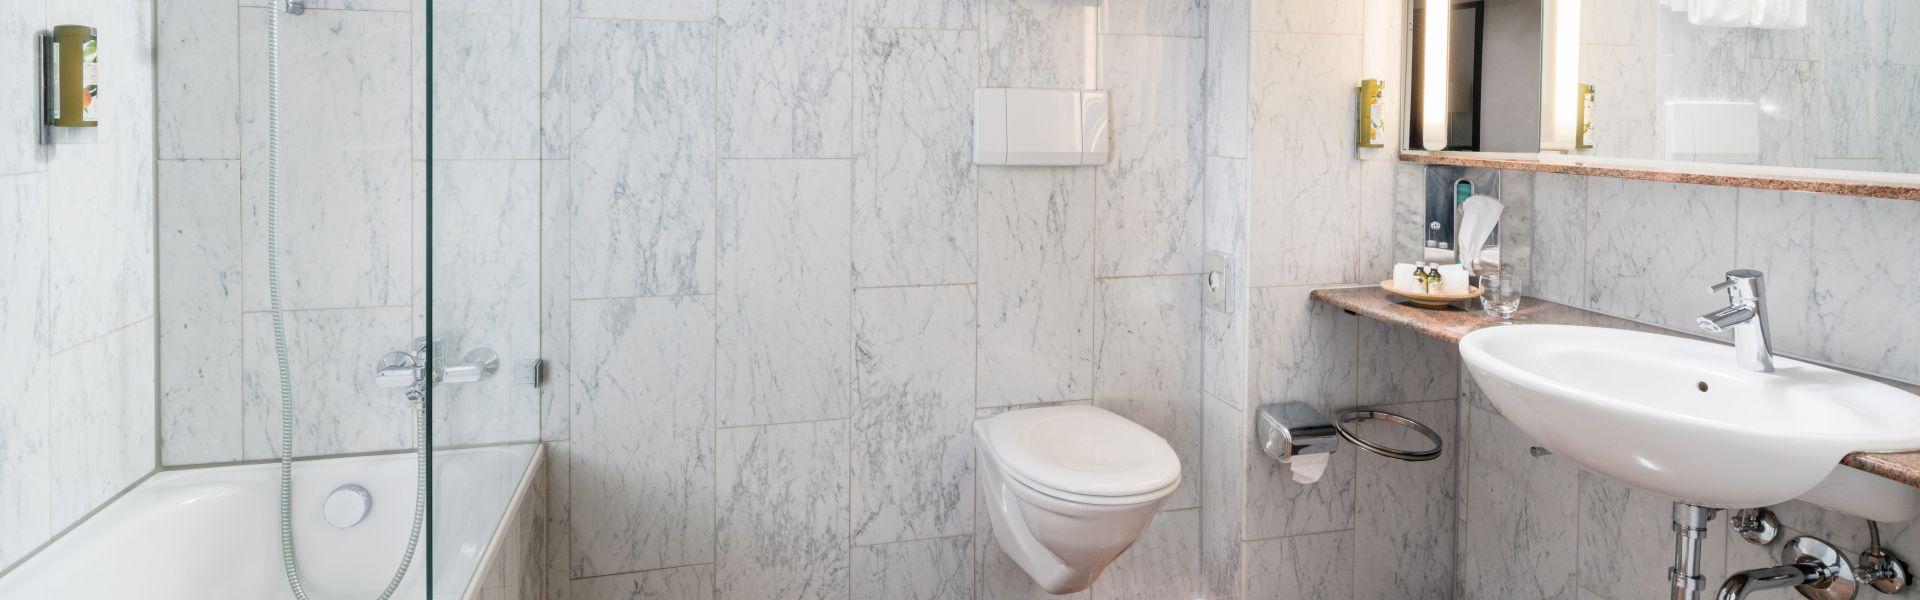 Bielefelder Hof Badezimmer